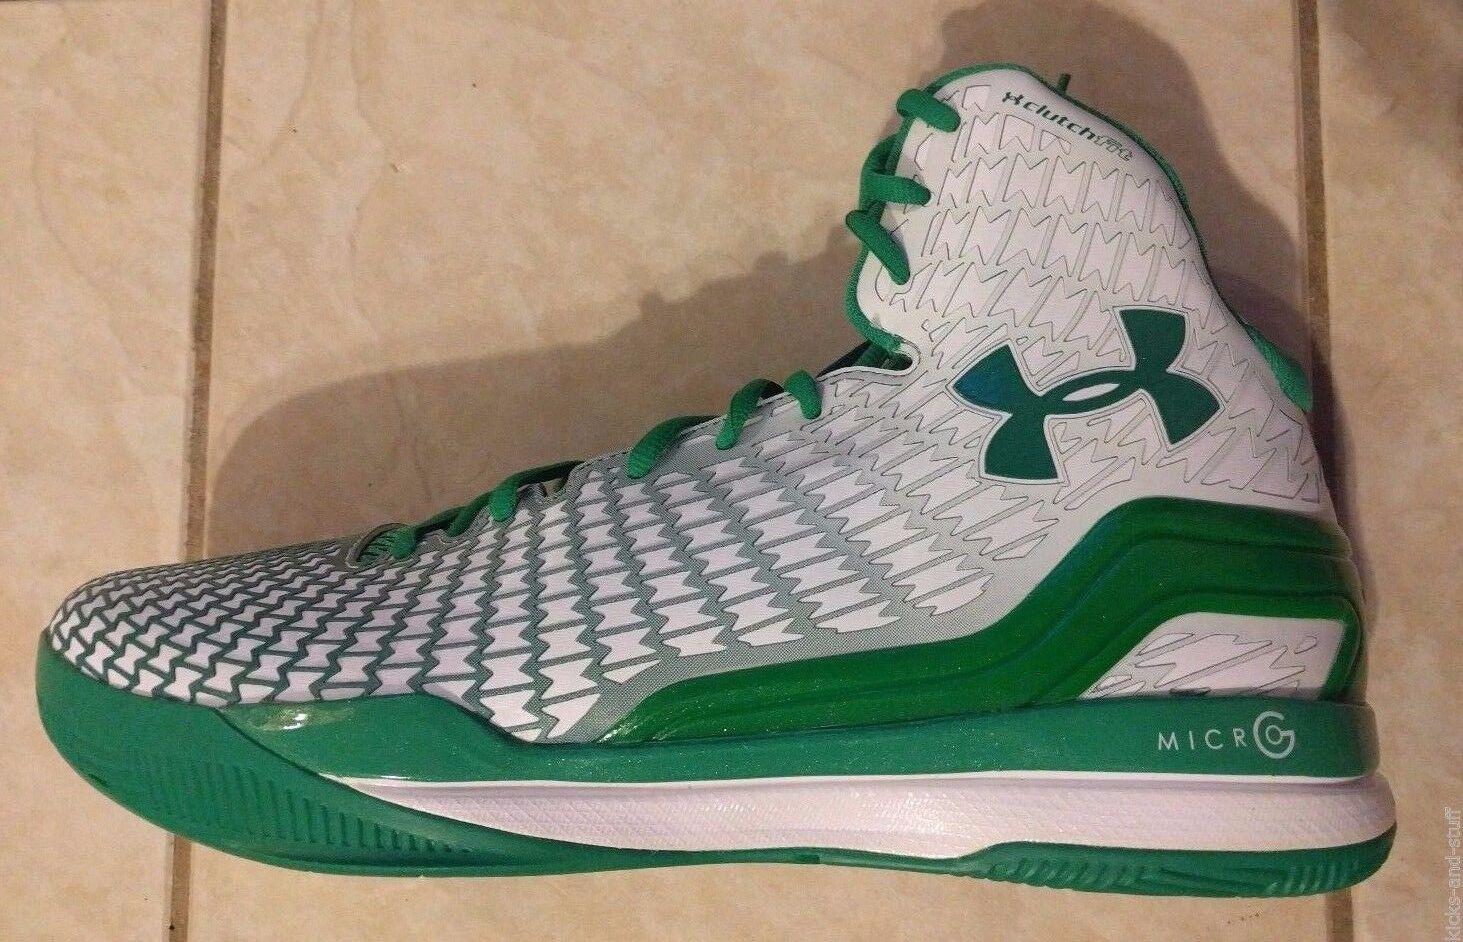 Notre Dame Fighting Irish Basketball Under Armour Clutchfit Drive Green Sz 13.5 Scarpe classiche da uomo